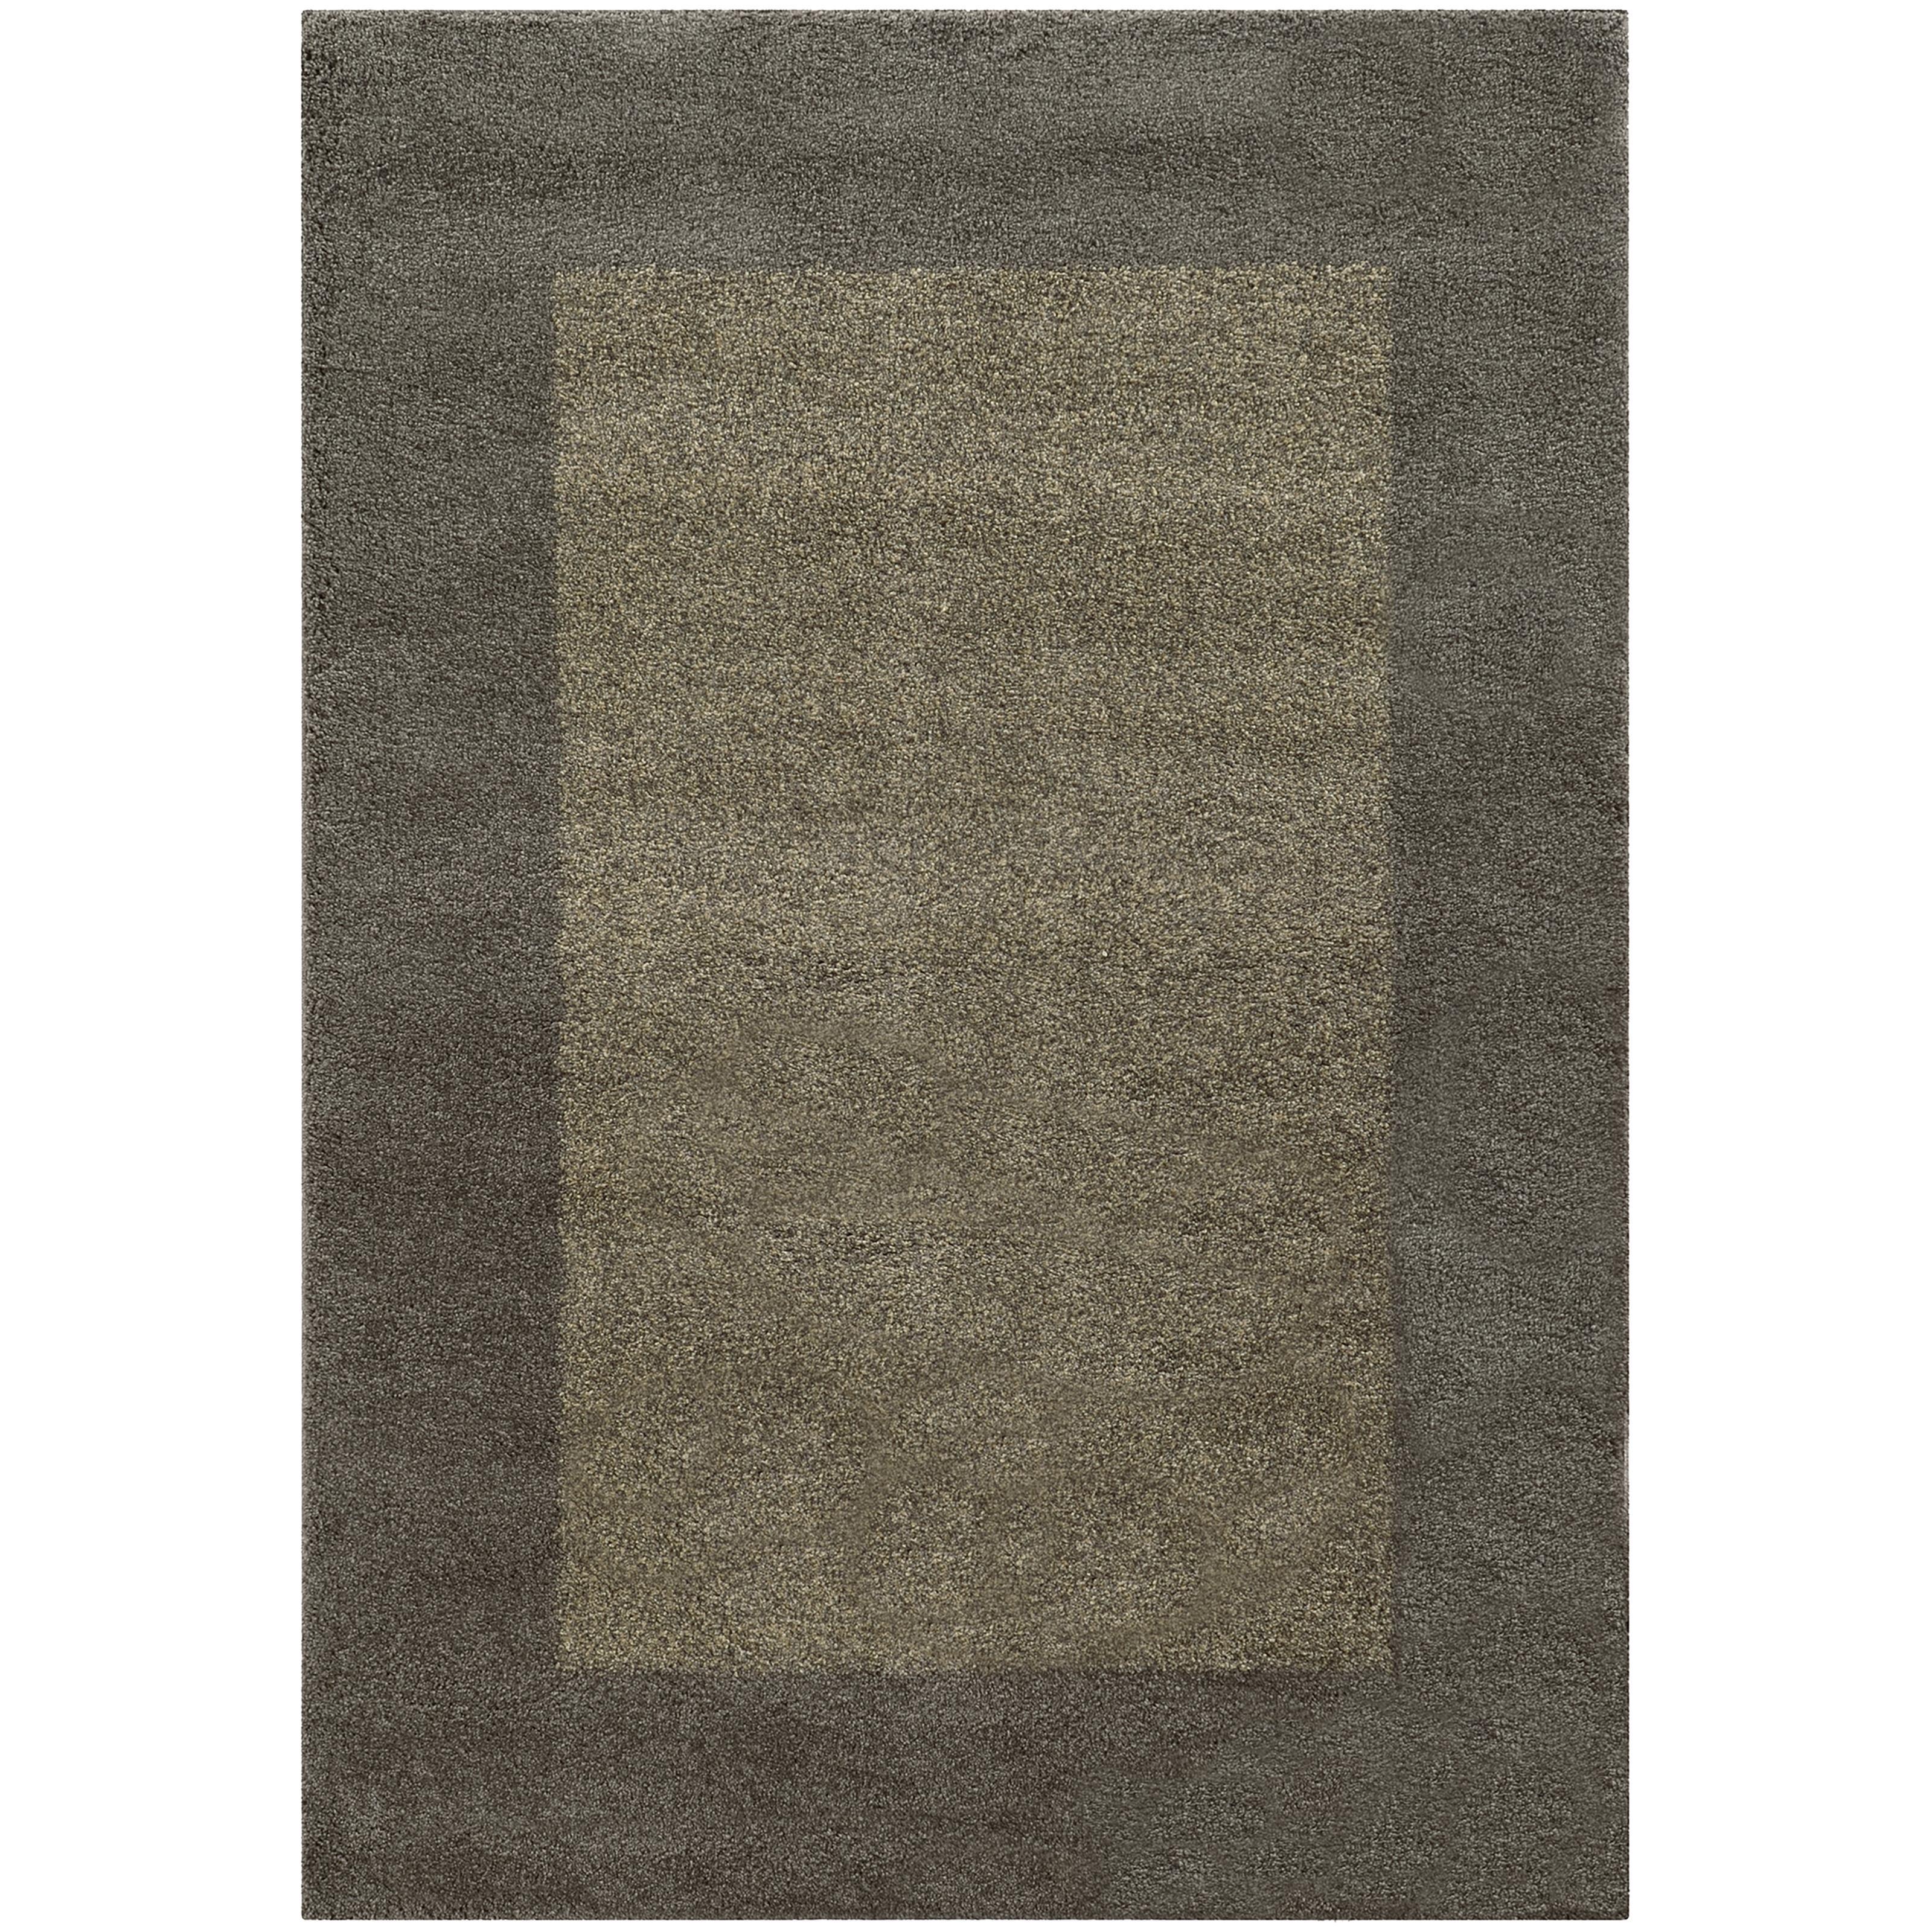 "Covington 9'10"" X 12'10"" Rug by Oriental Weavers at Novello Home Furnishings"